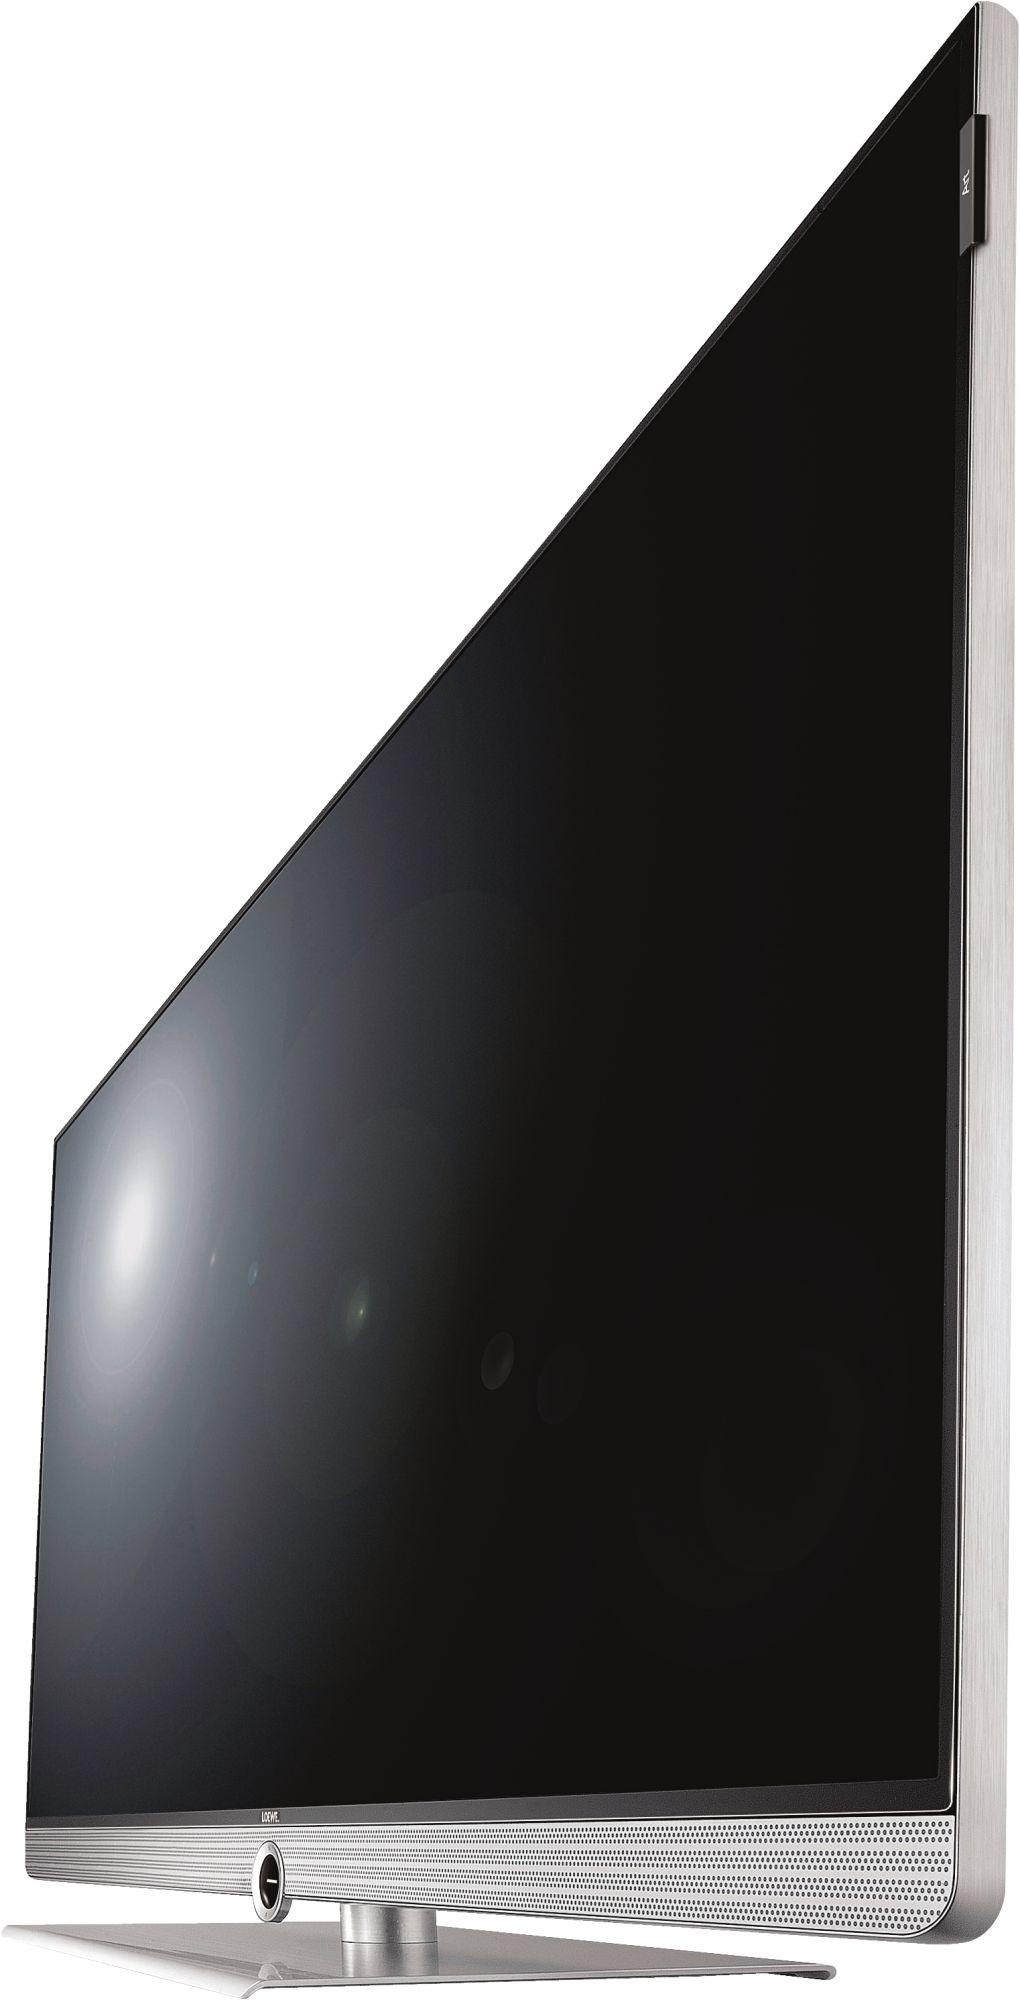 TeamSix - Art 55 UHD / Chrom-Silber Loewe normal - 50 - 59 pollici ...